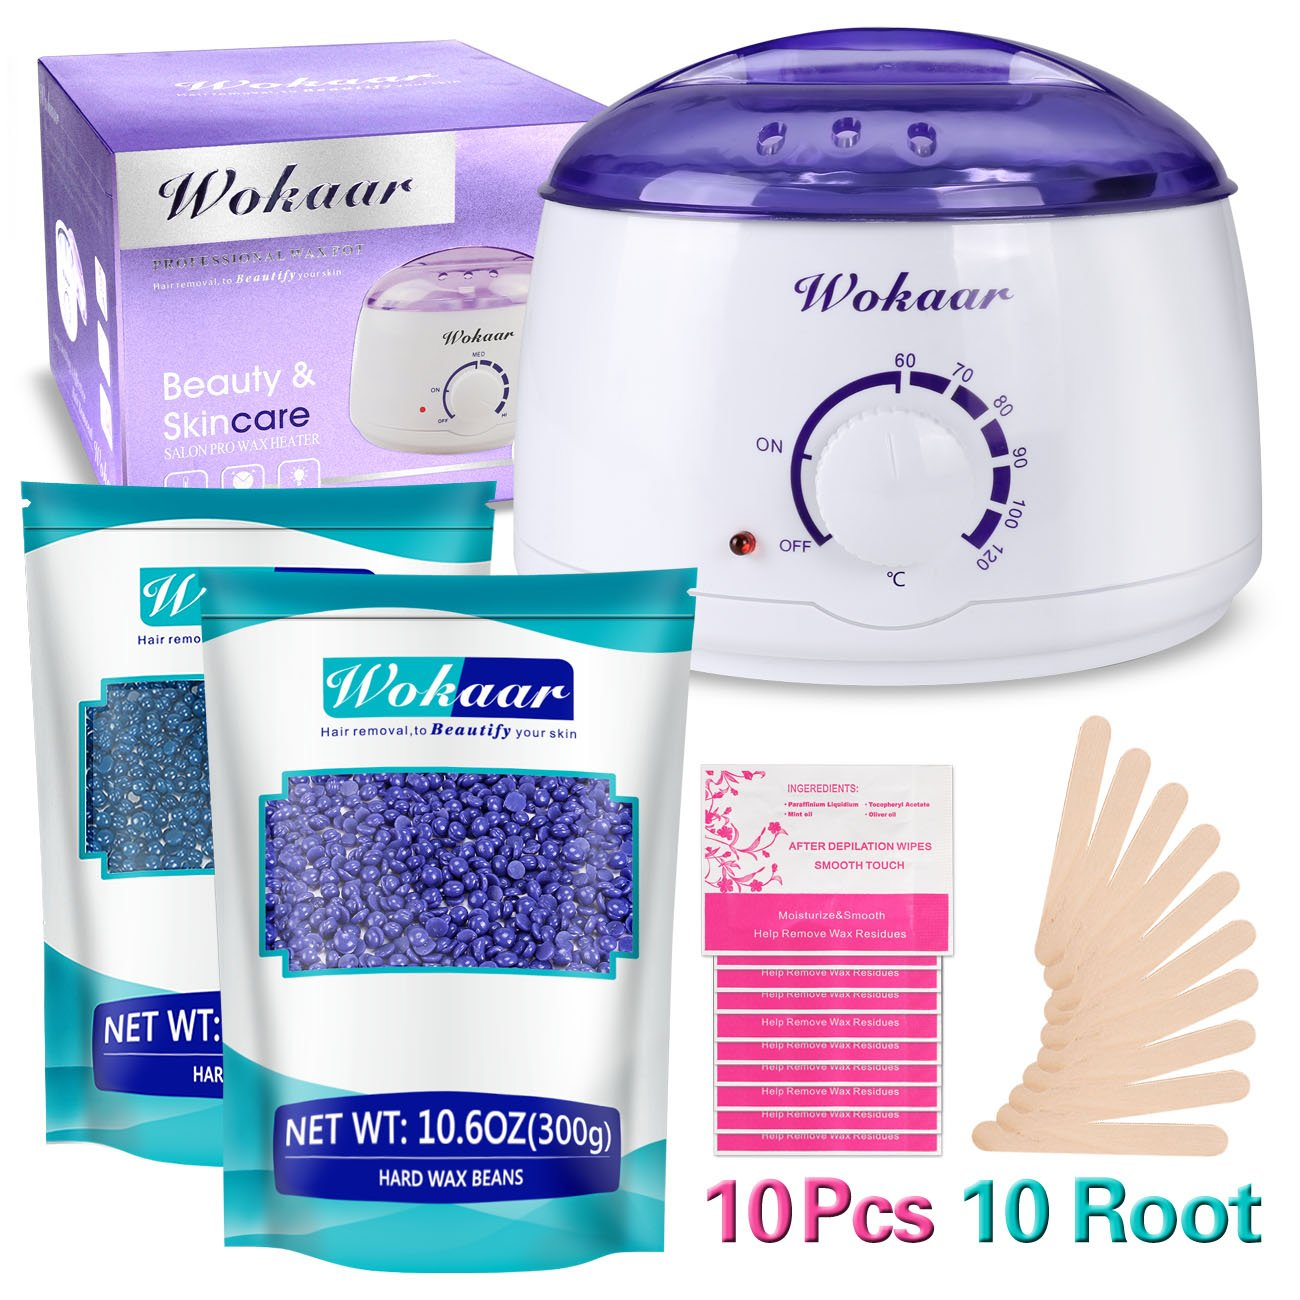 WOKAAR Wax Kit Wax Heater Electric Wax Warmer Hair Removal Waxing Kit Rapid Melt with 600g Wax Beans & 10 Wax Applicator Sticks & 10 Wax Remove Paper